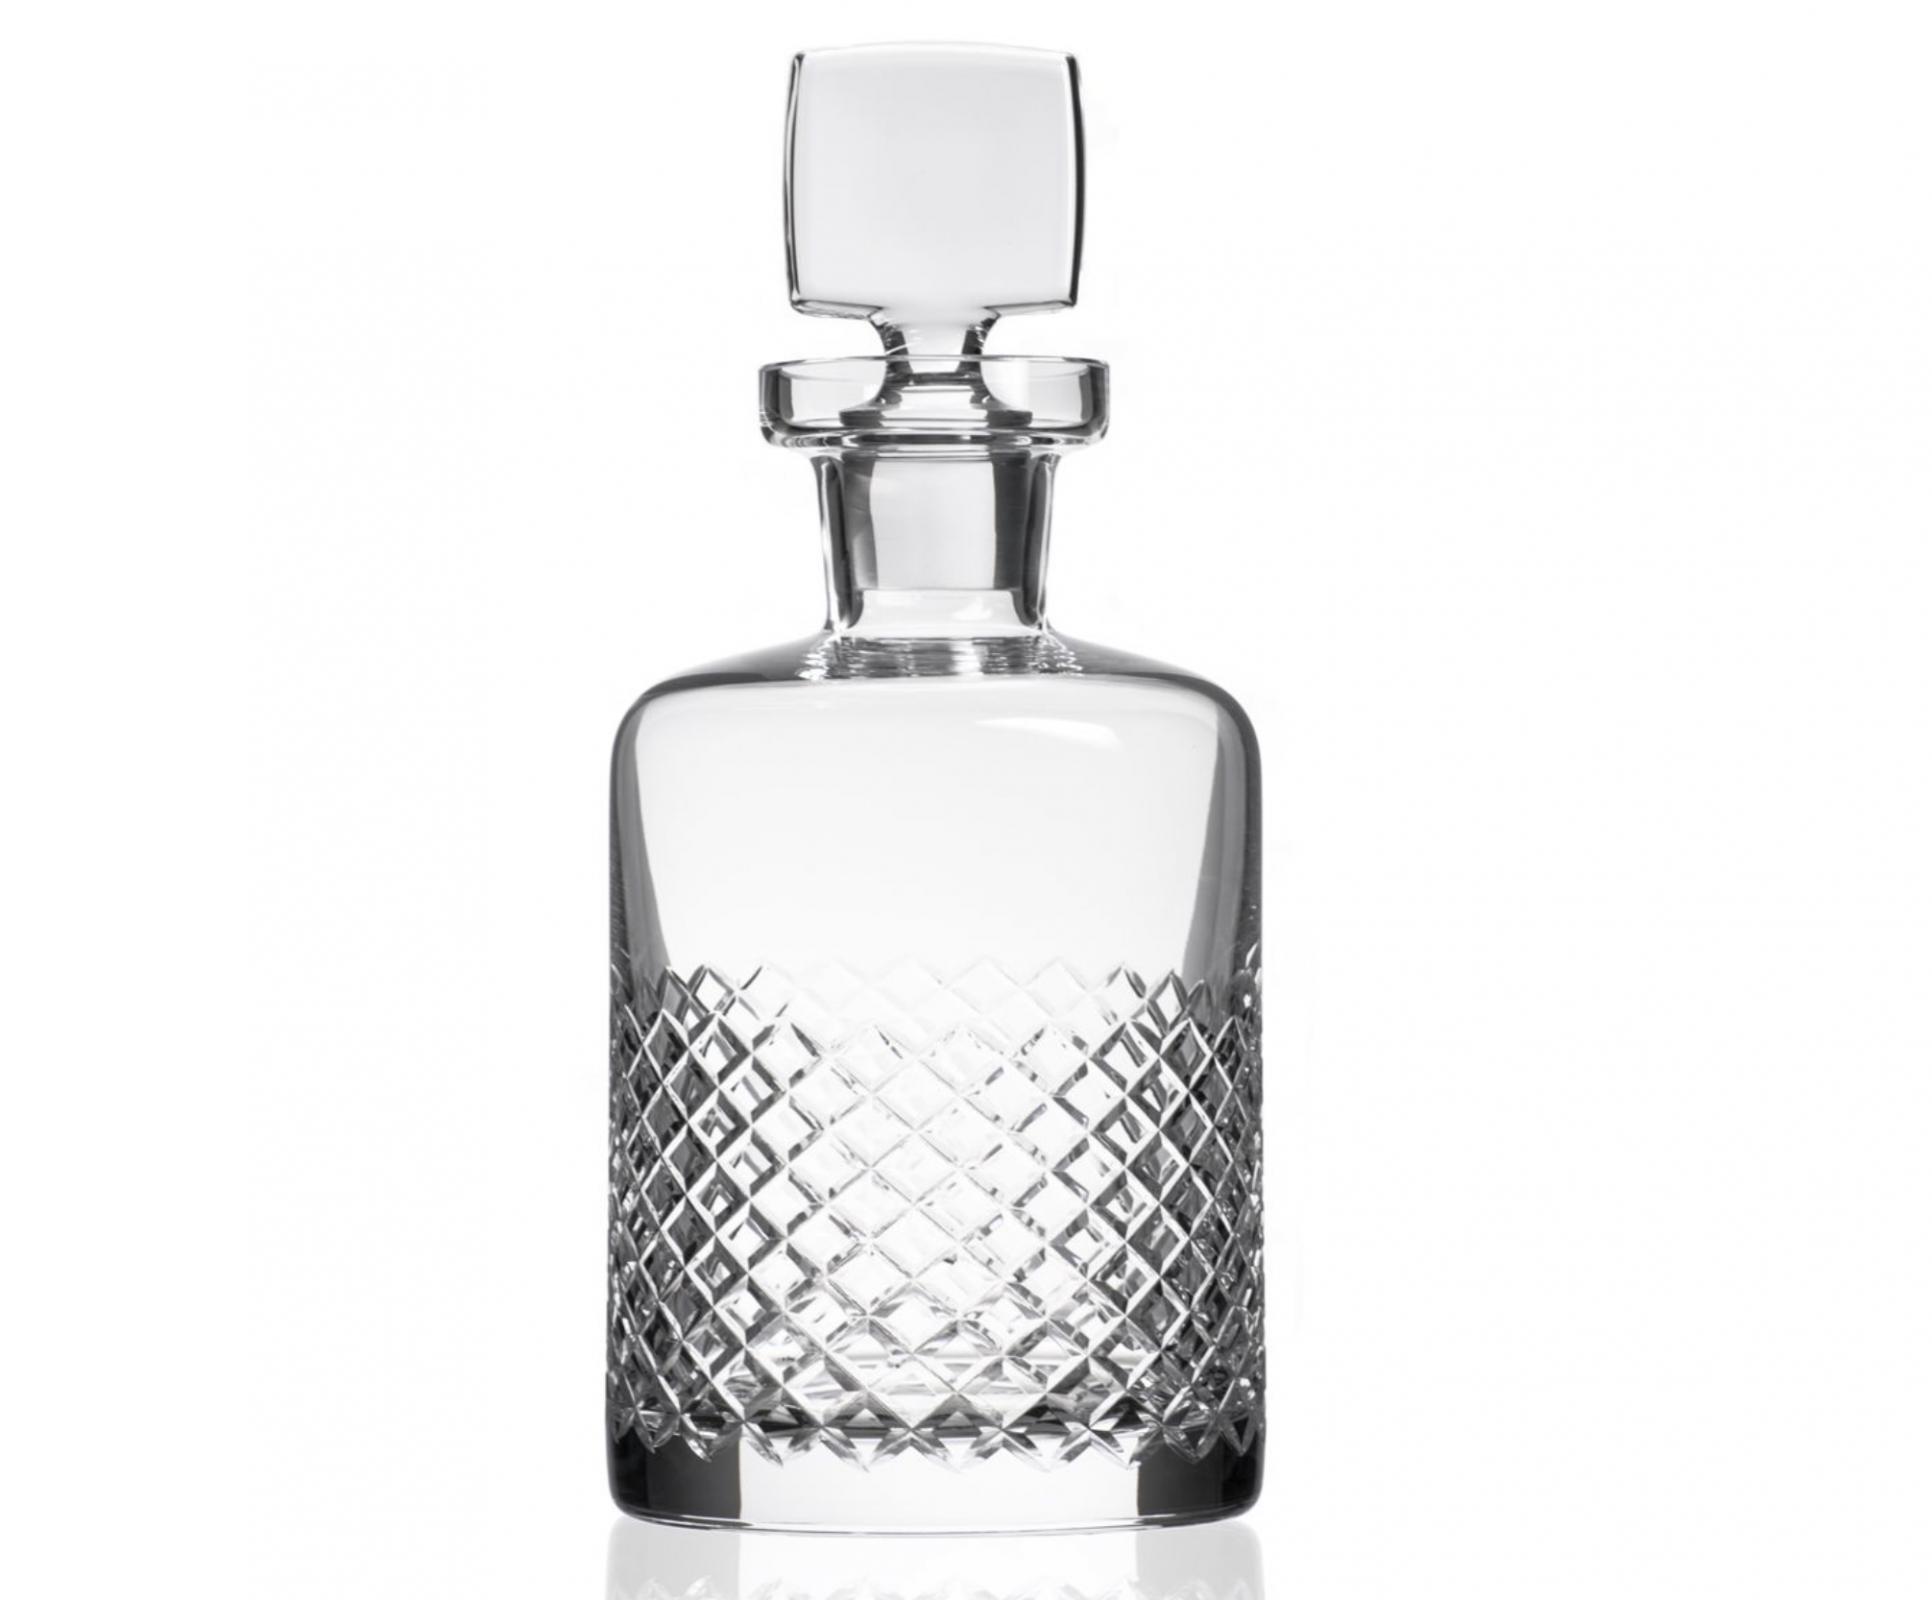 Rolf Diamond 40oz Whiskey Decanter